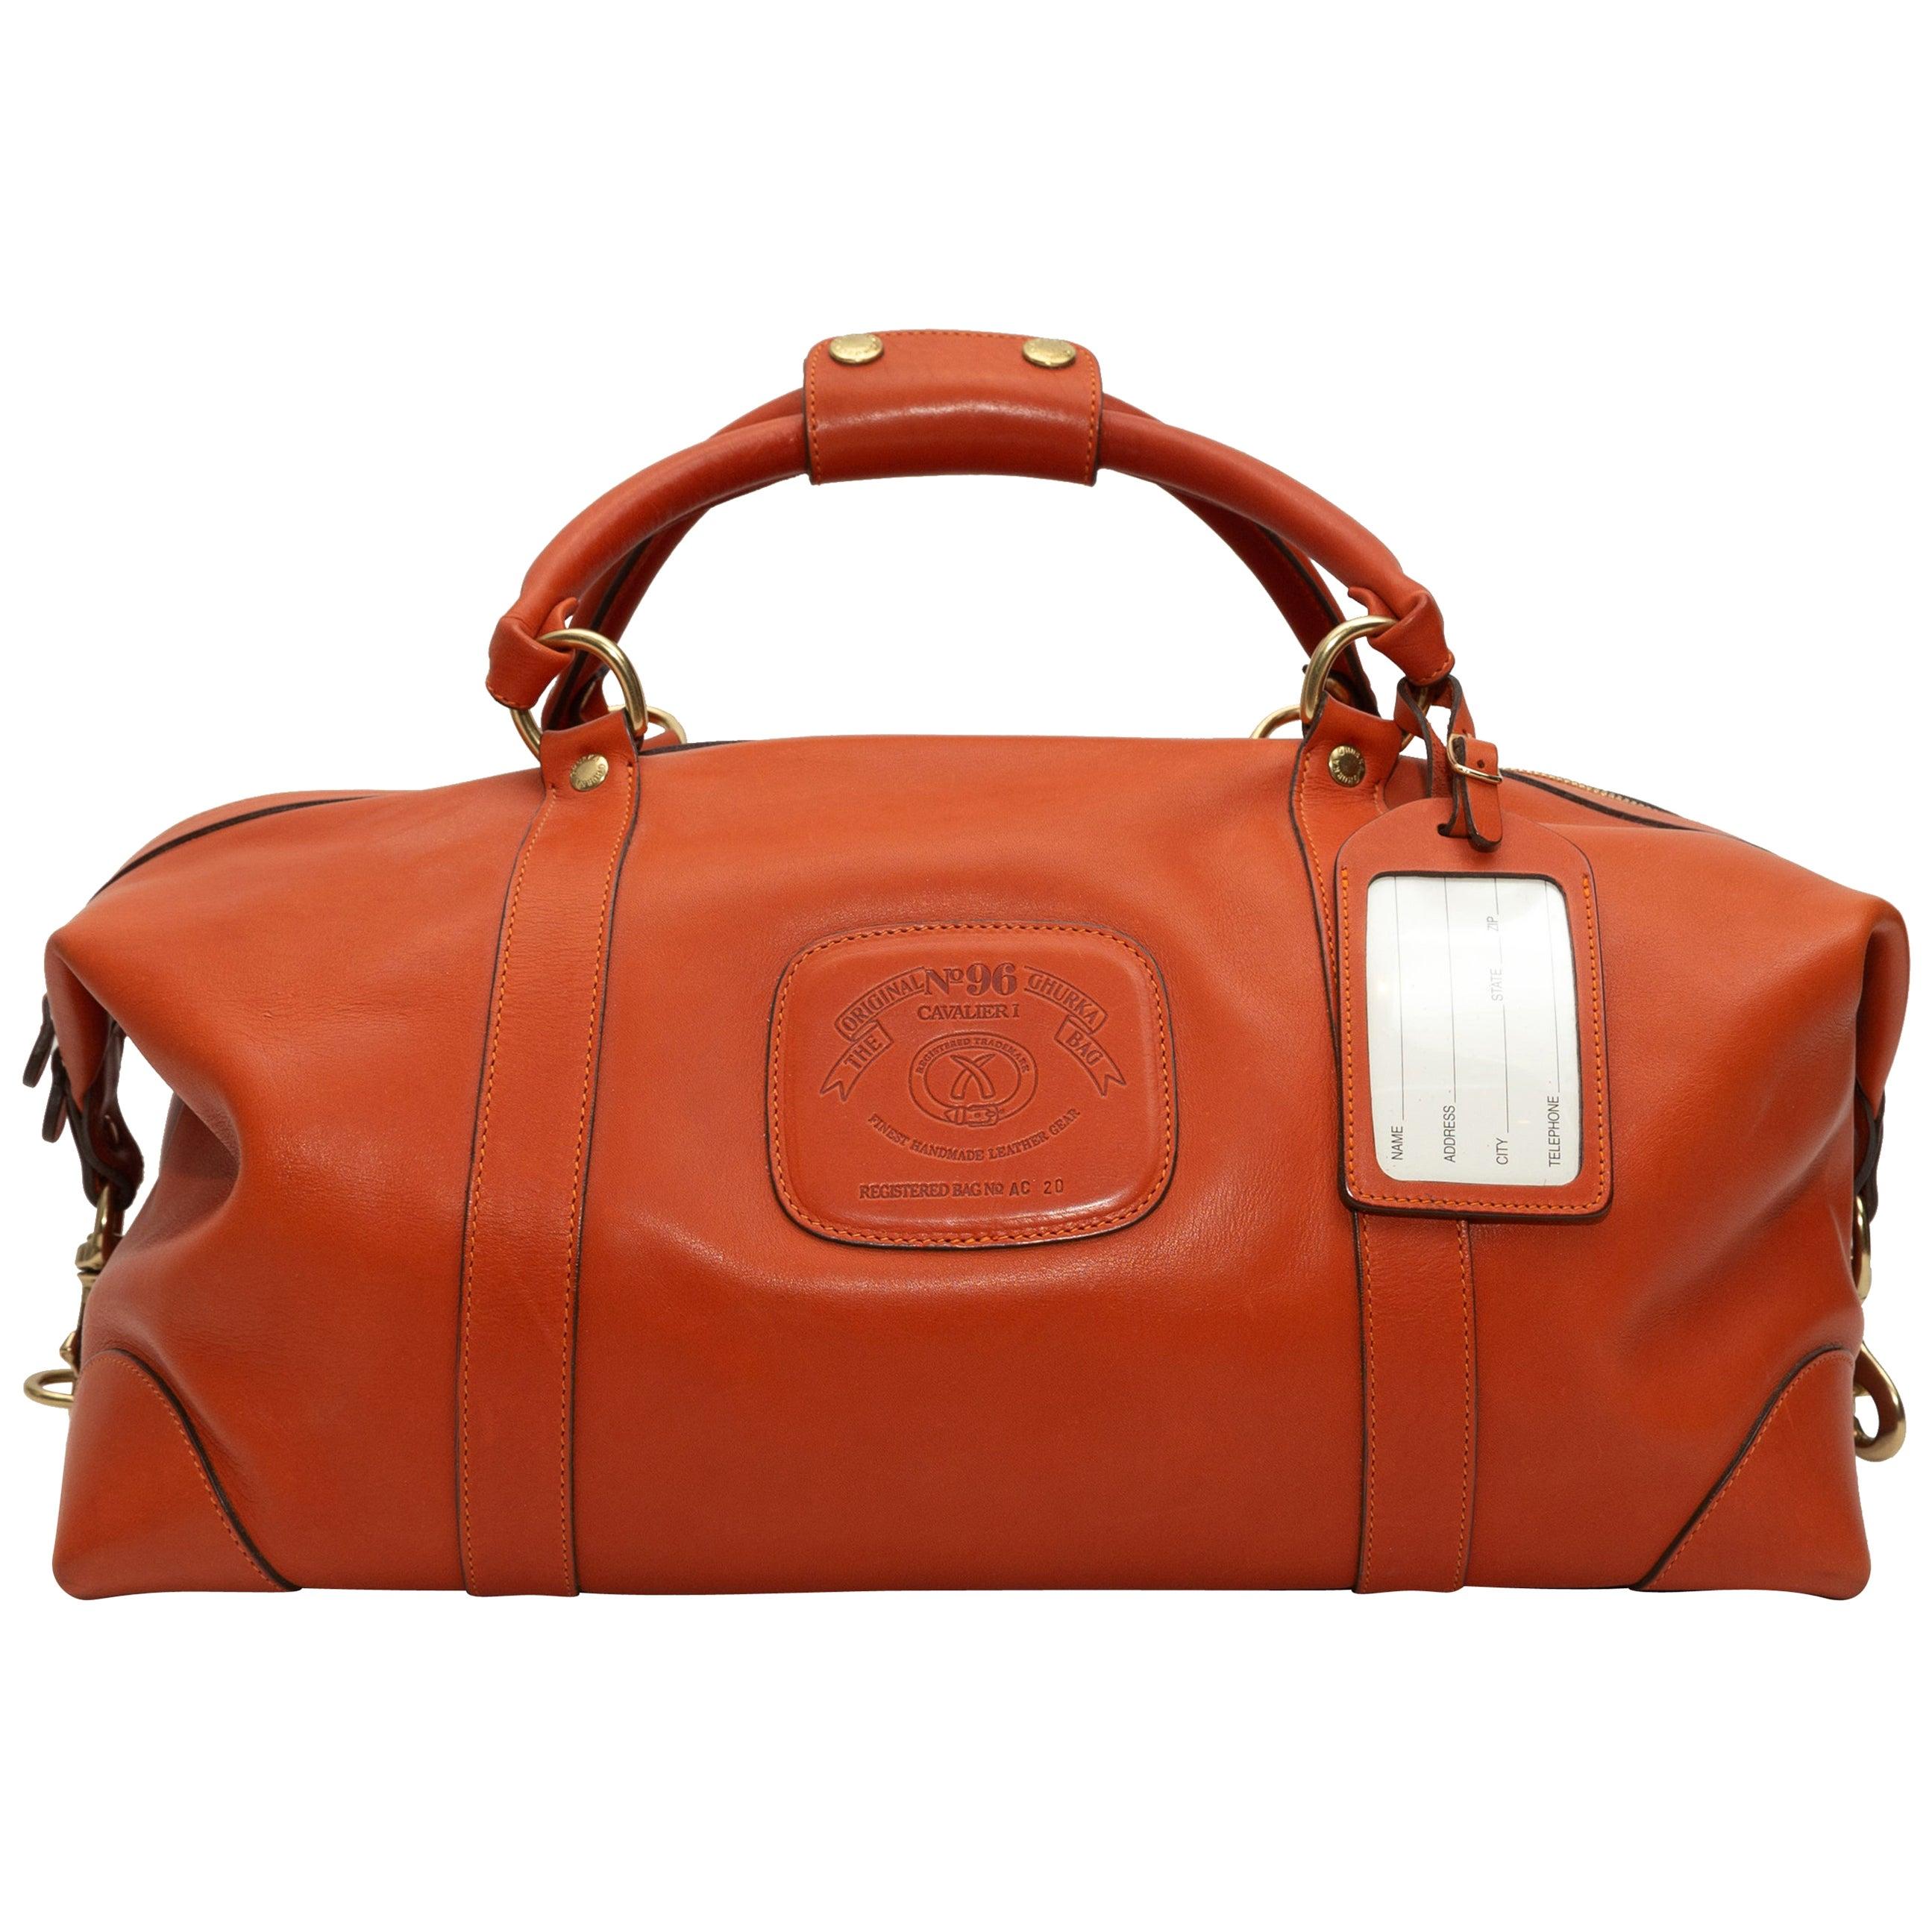 Ghurka Orange Leather No. 96 Cavalier Duffel Bag